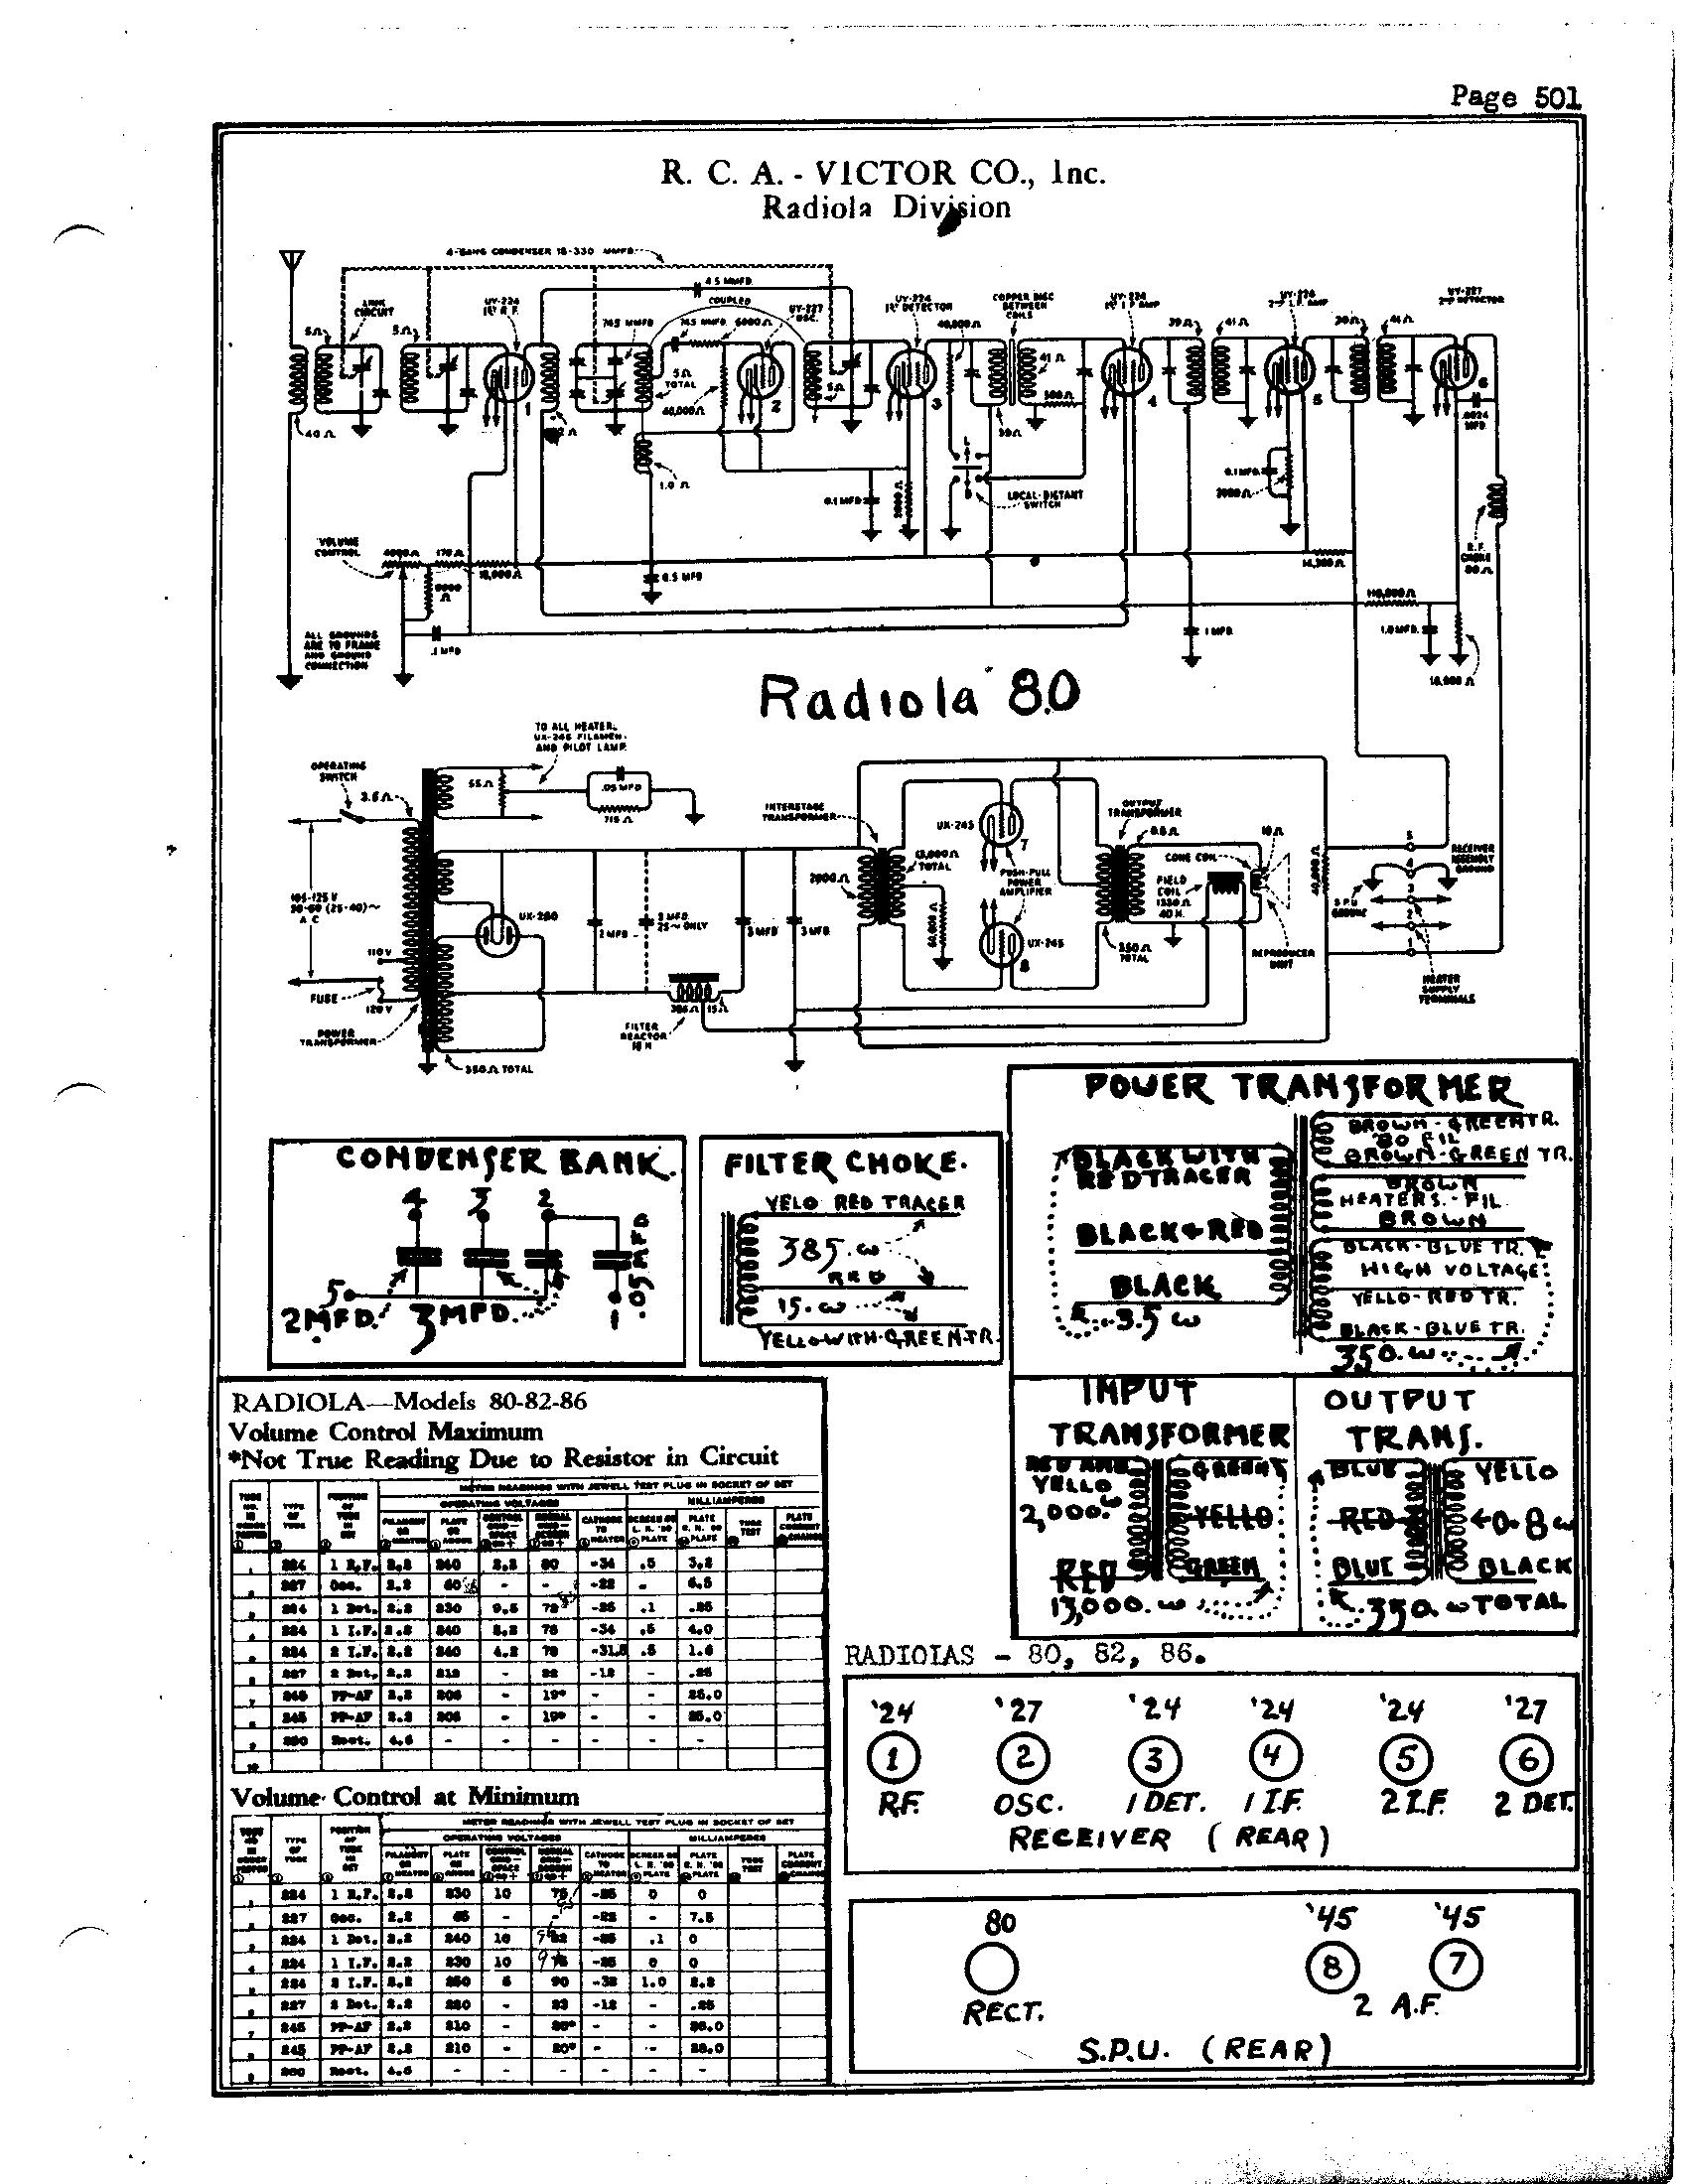 DIAGRAM] Audi 80 Stereo Wiring Diagram FULL Version HD Quality Wiring  Diagram - SUSPENSIONARMOR.LIONSICILIA.ITlionsicilia.it